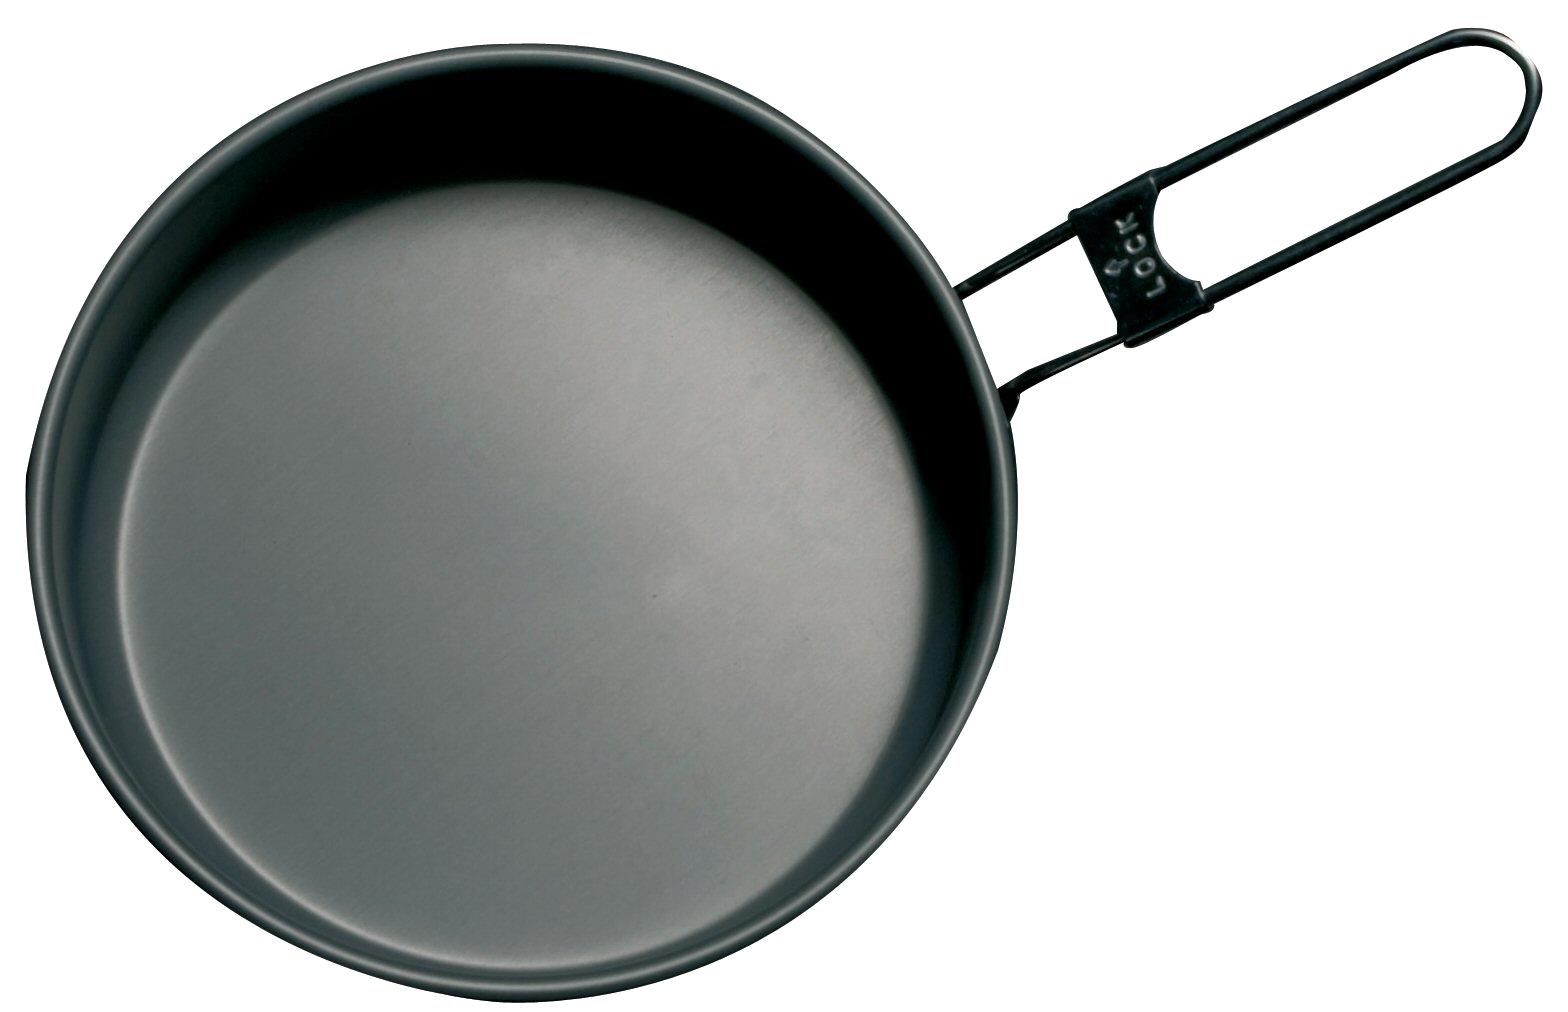 frying pan png image clipart panda free clipart images rh clipartpanda com Cast Iron Frying Pan Clip Art frying pan clipart png